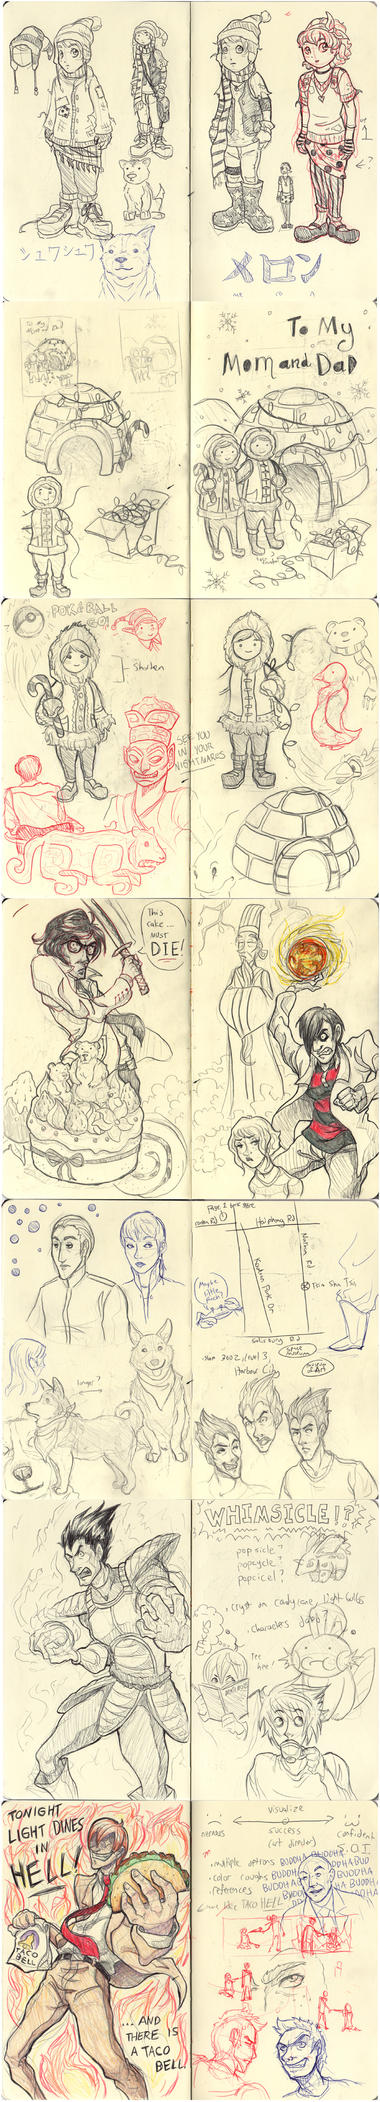 HK Sketchbook 2 by Oriana132